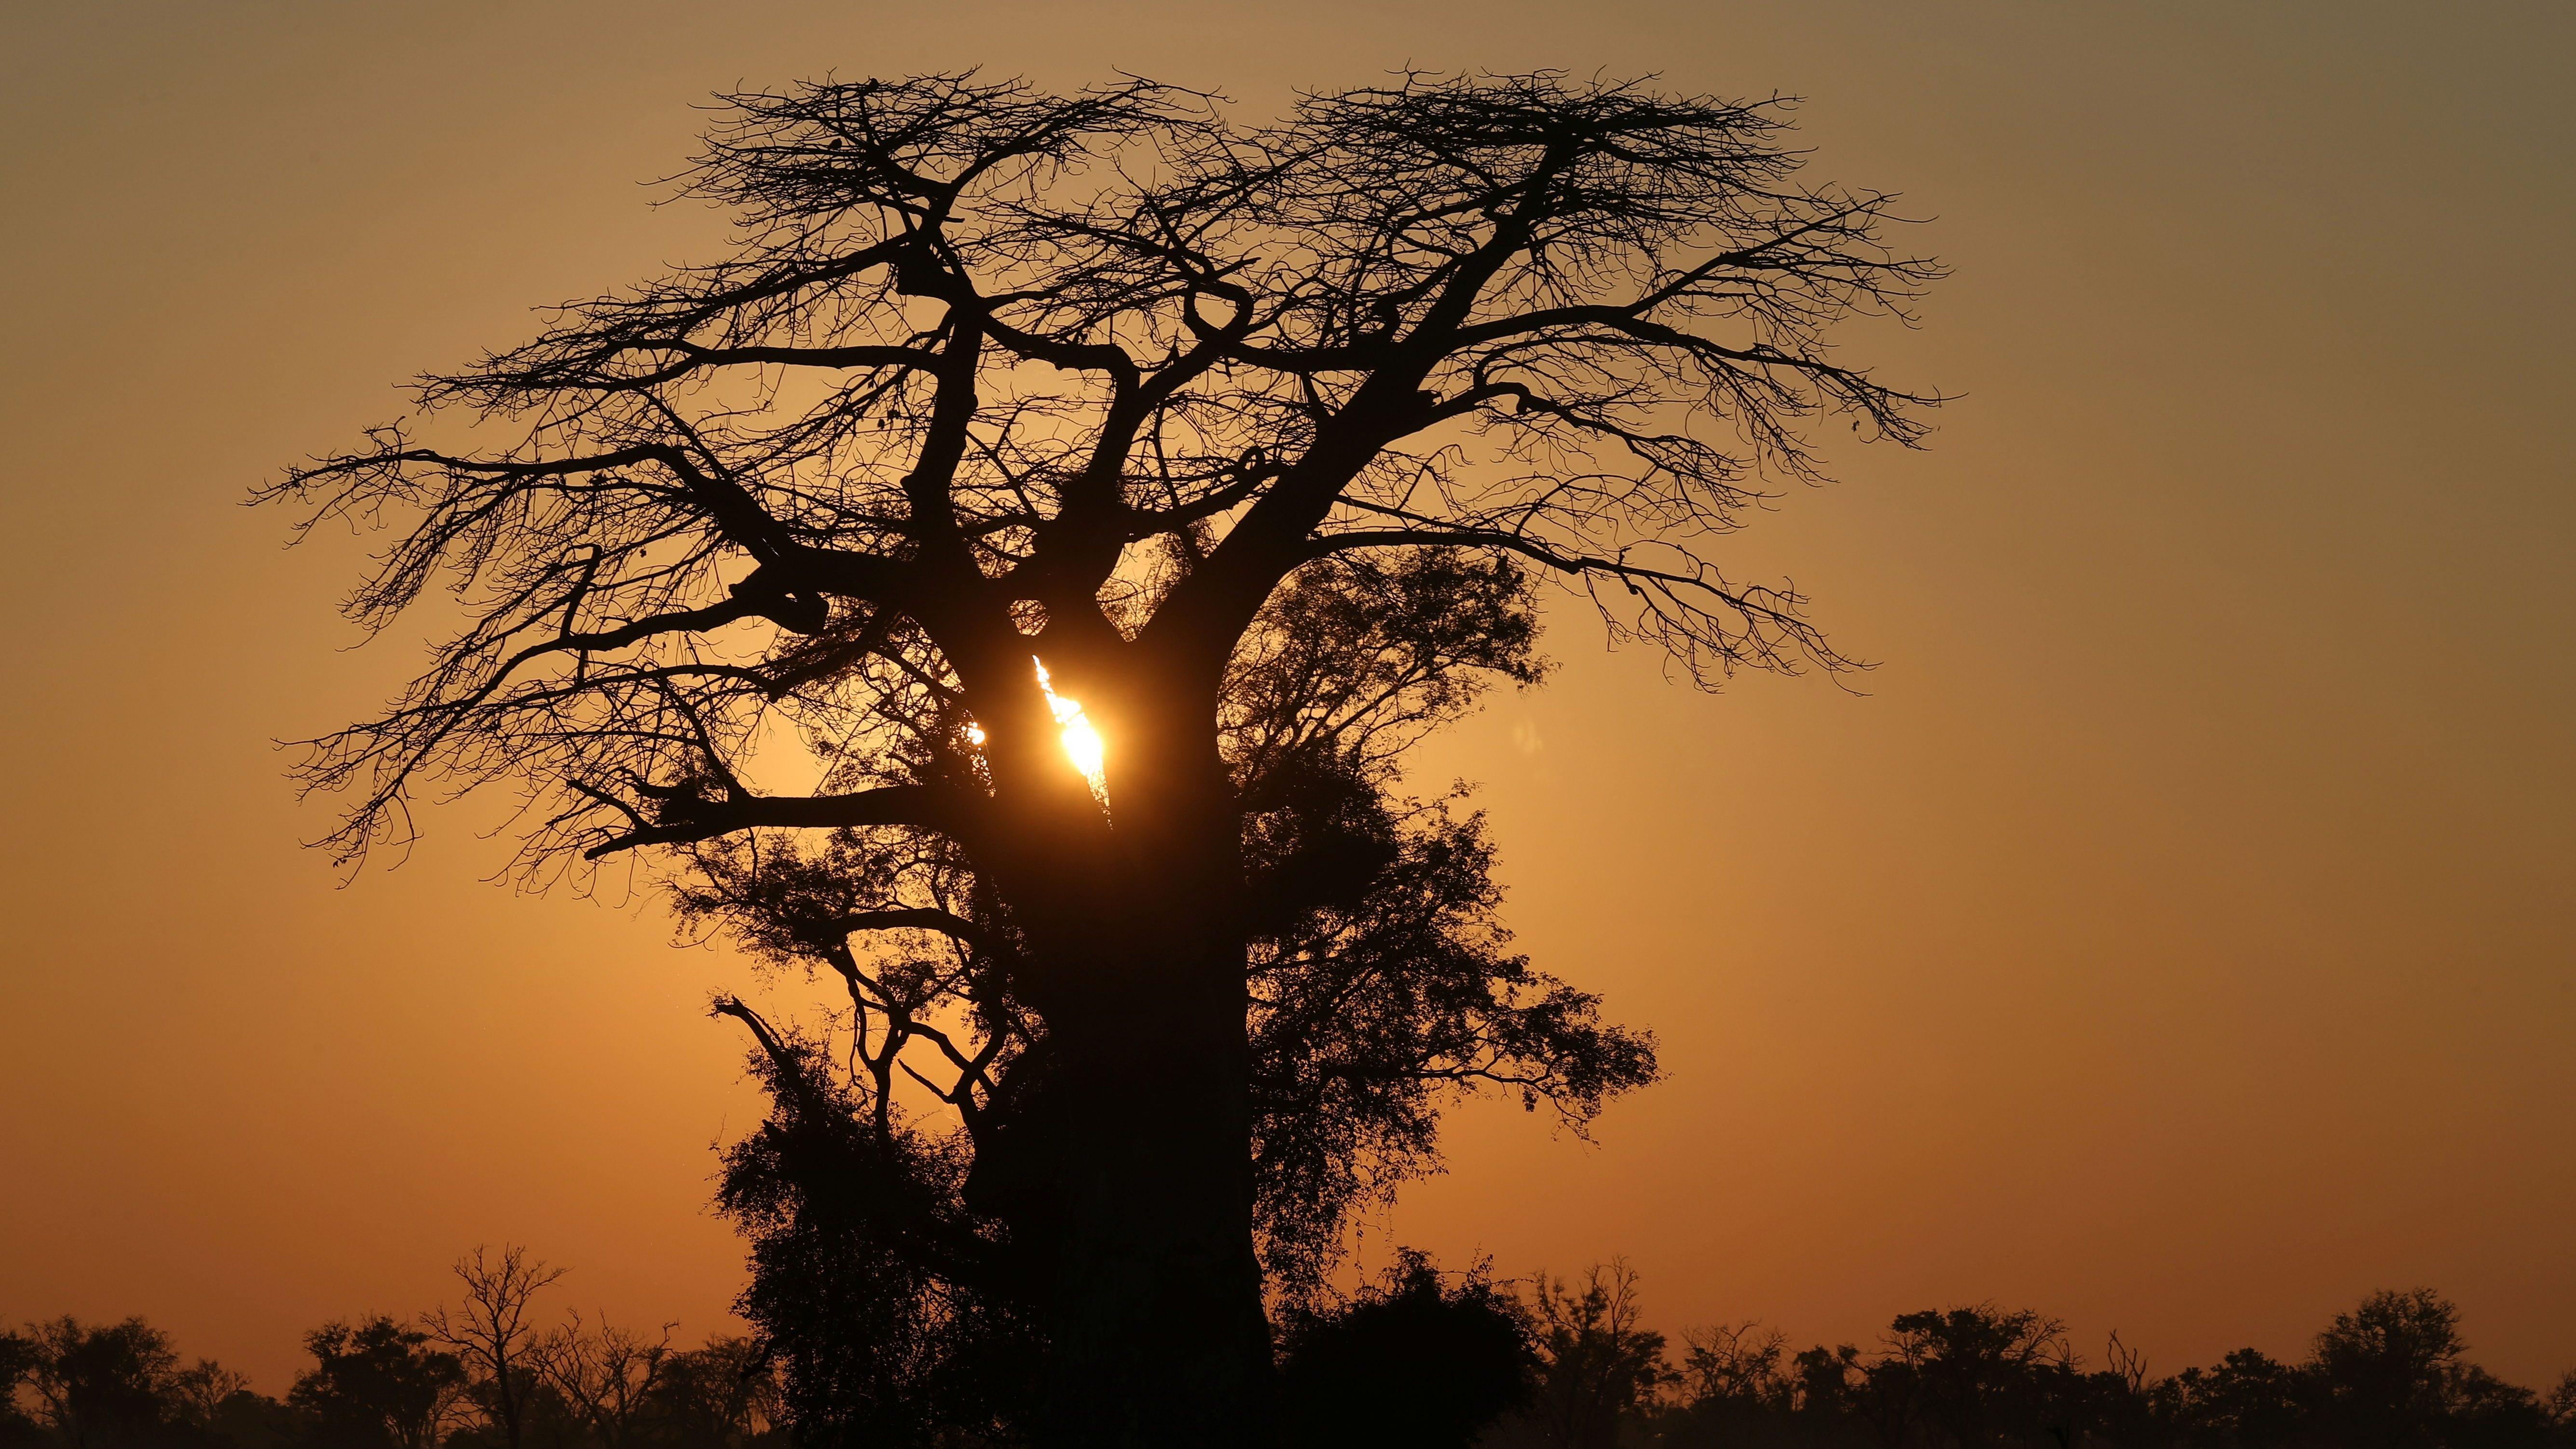 The sun rises behind a Baobab tree in the Okavango Delta, Botswana, April 25, 2018.